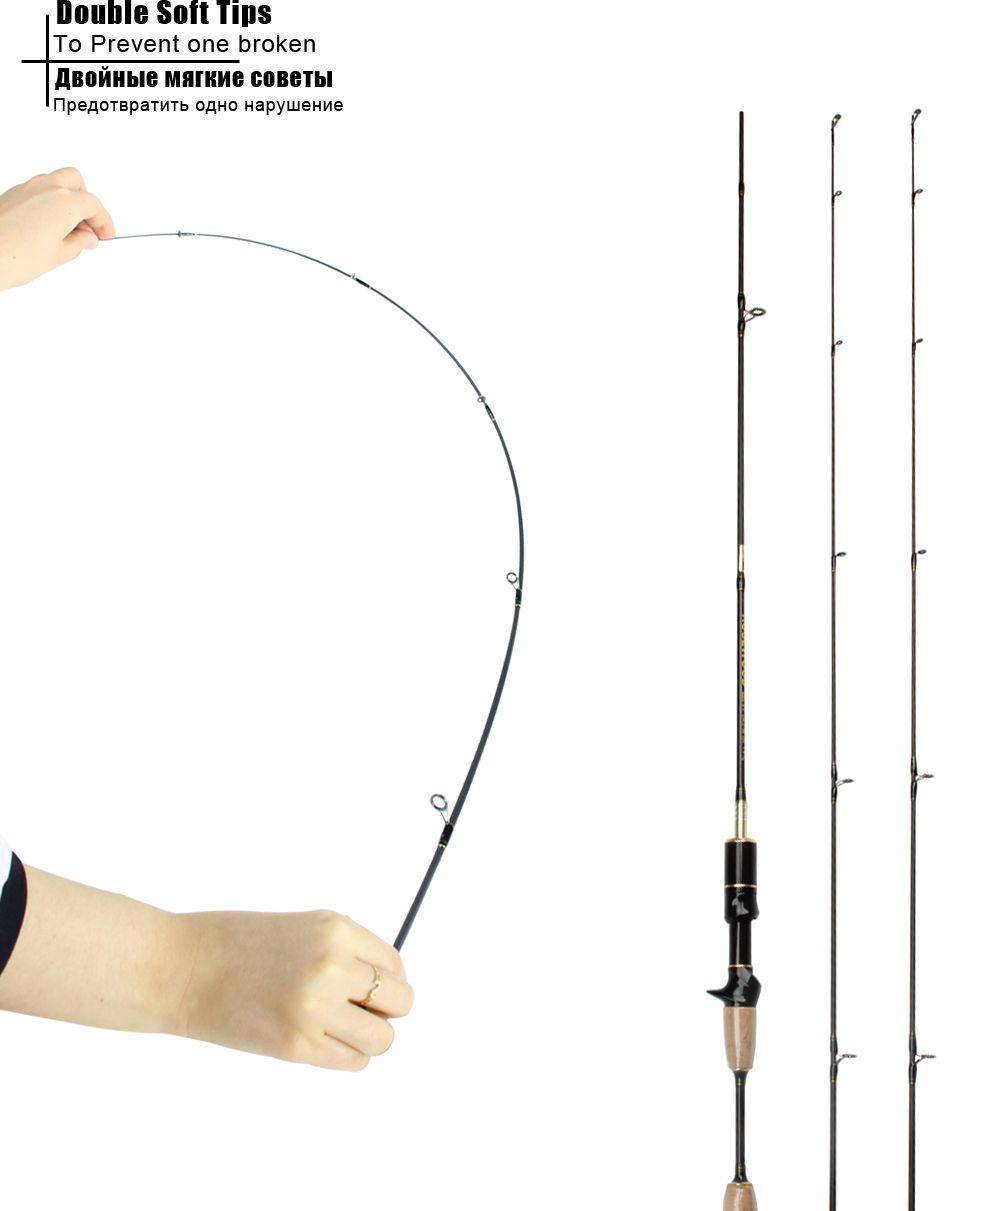 medium resolution of rosewood 1 8m double tip ul fishing rod 6 3 1 ultralight baitcasting reel set and casting rod fishing combo add pole bag